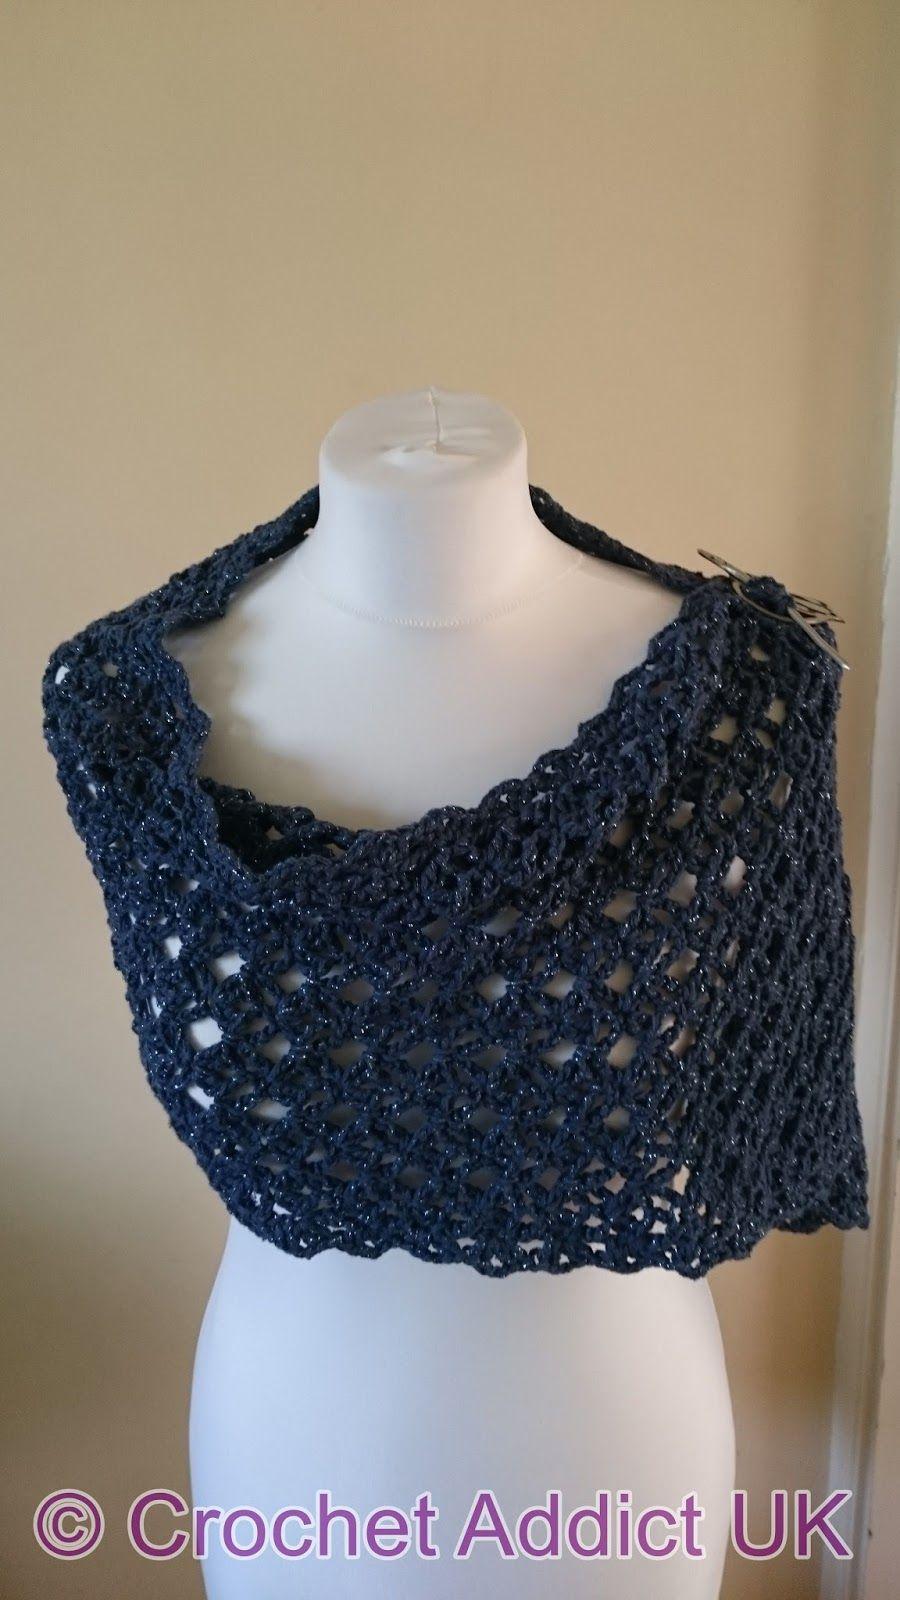 Crochet Addict UK: Flash of Evening Chill Shawl ~ Free Crochet ...